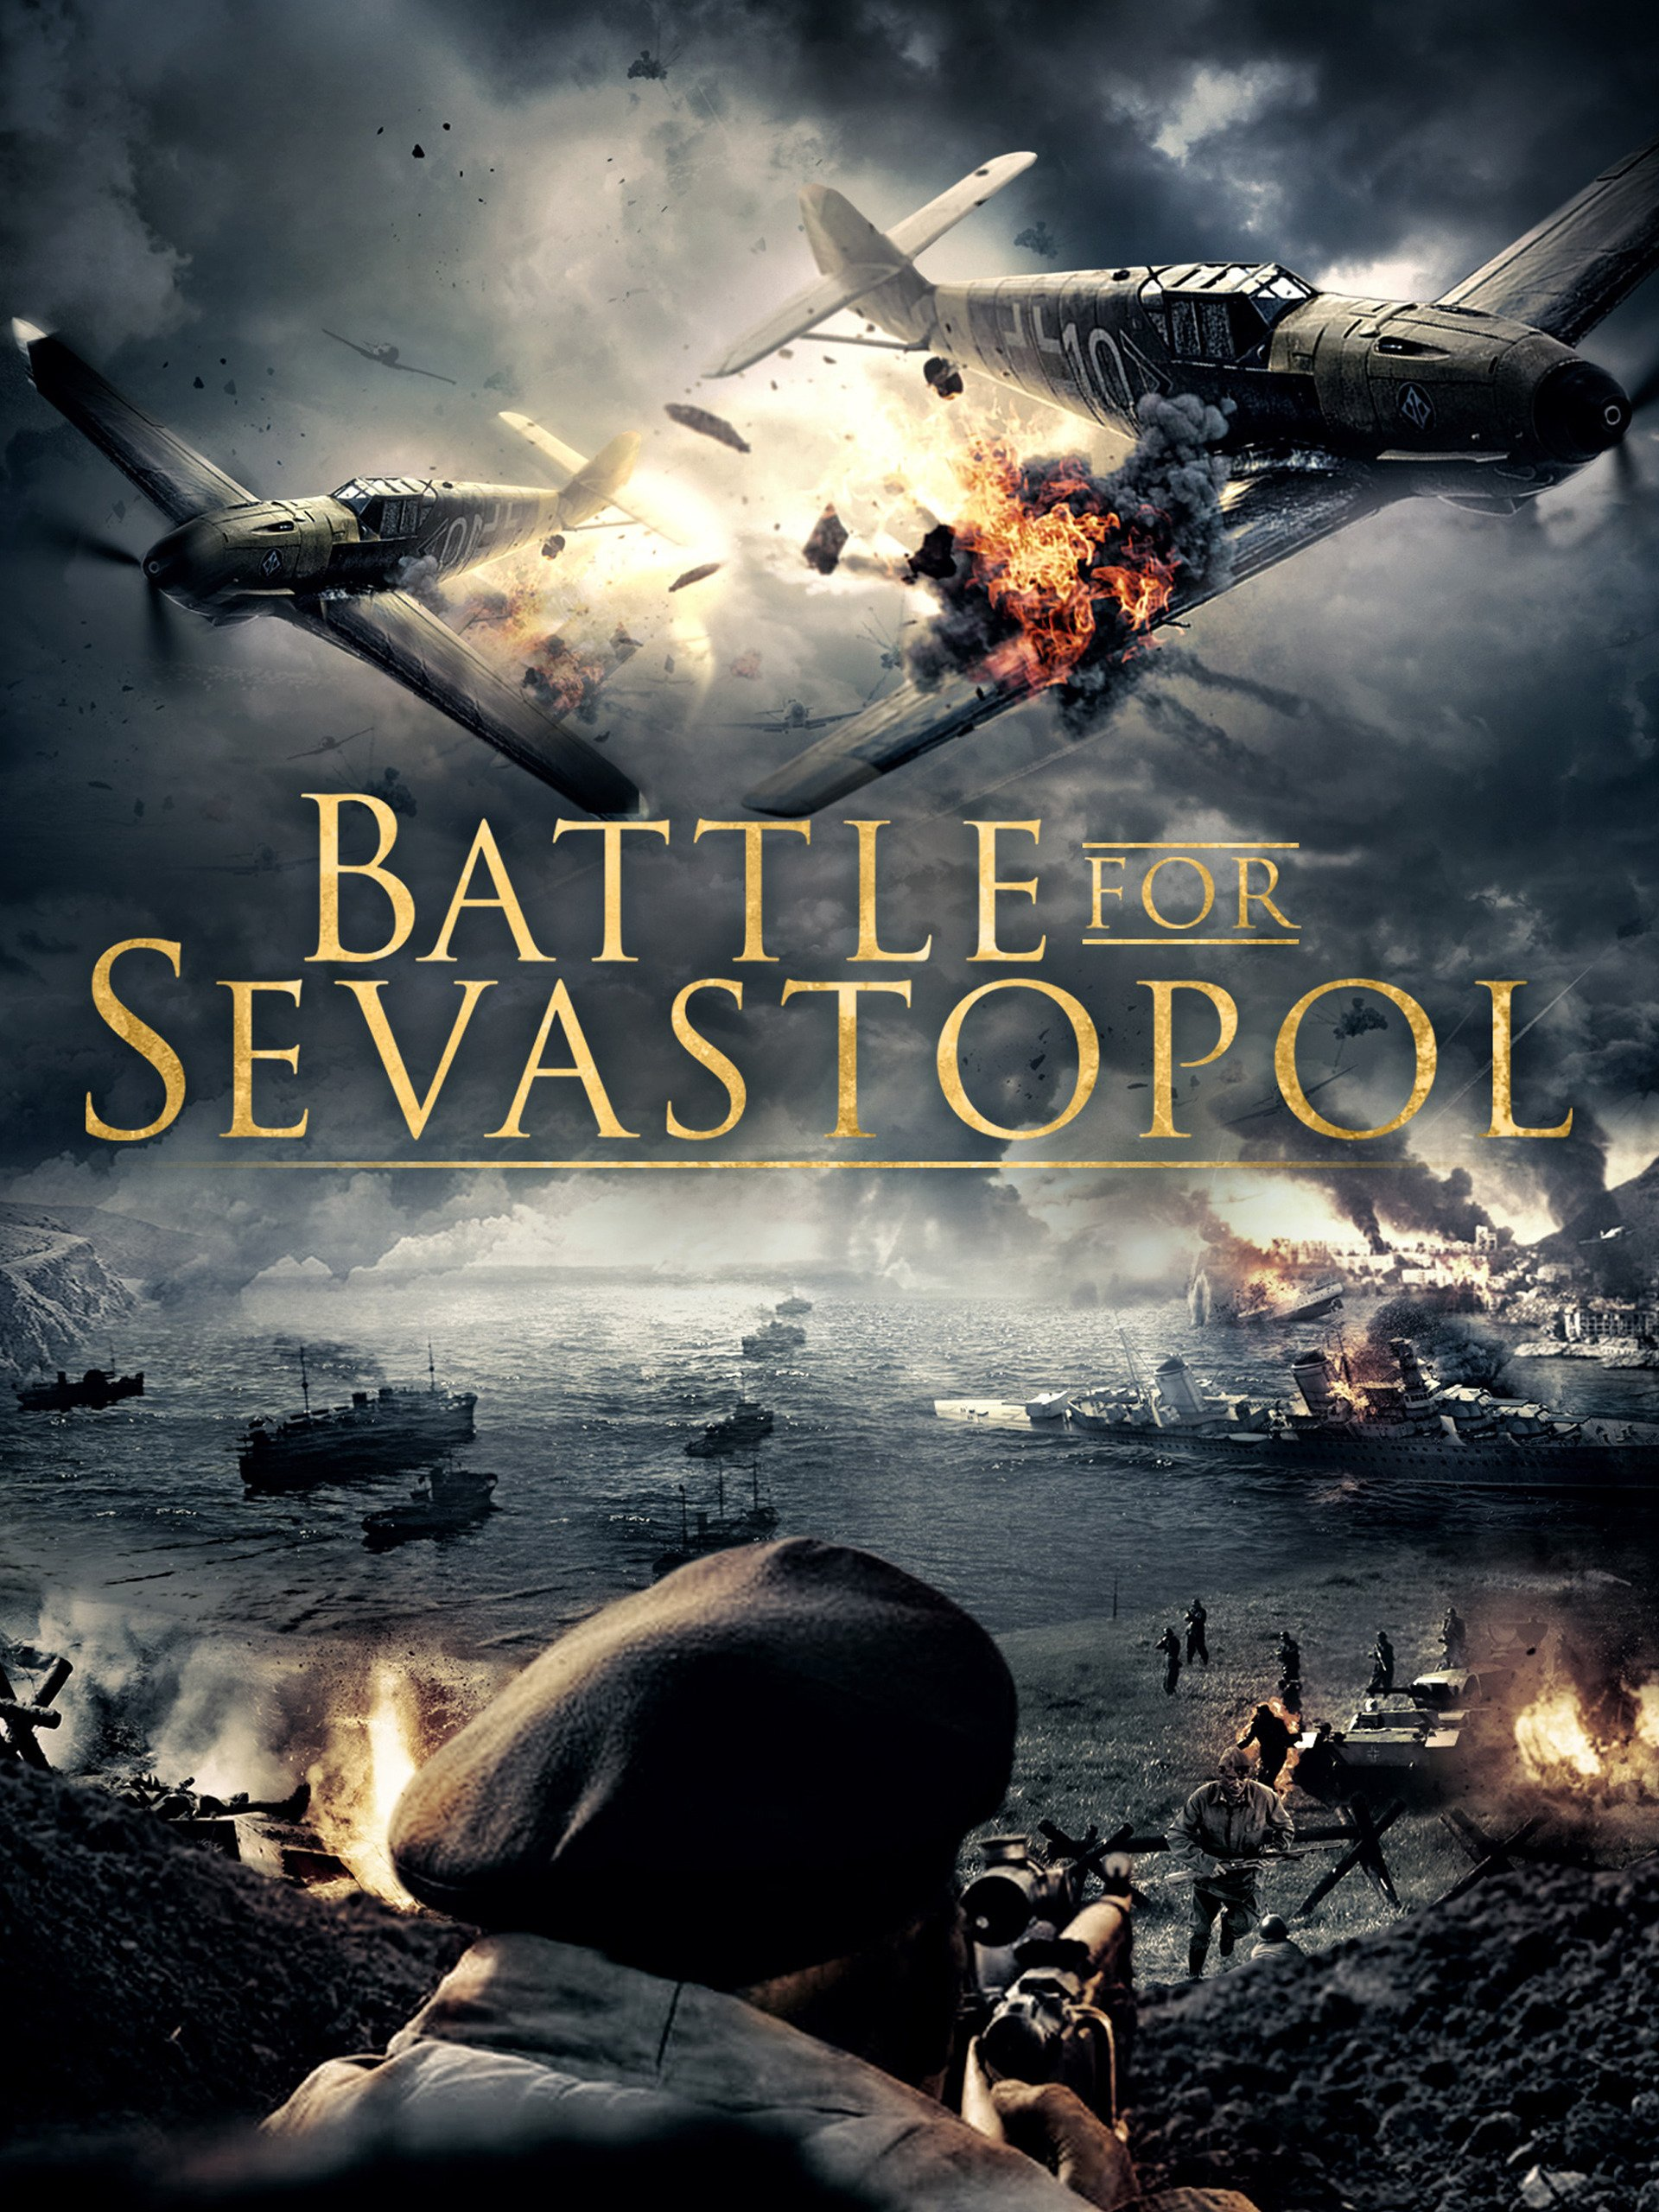 TsPSiR on Sevastopol: reviews 83